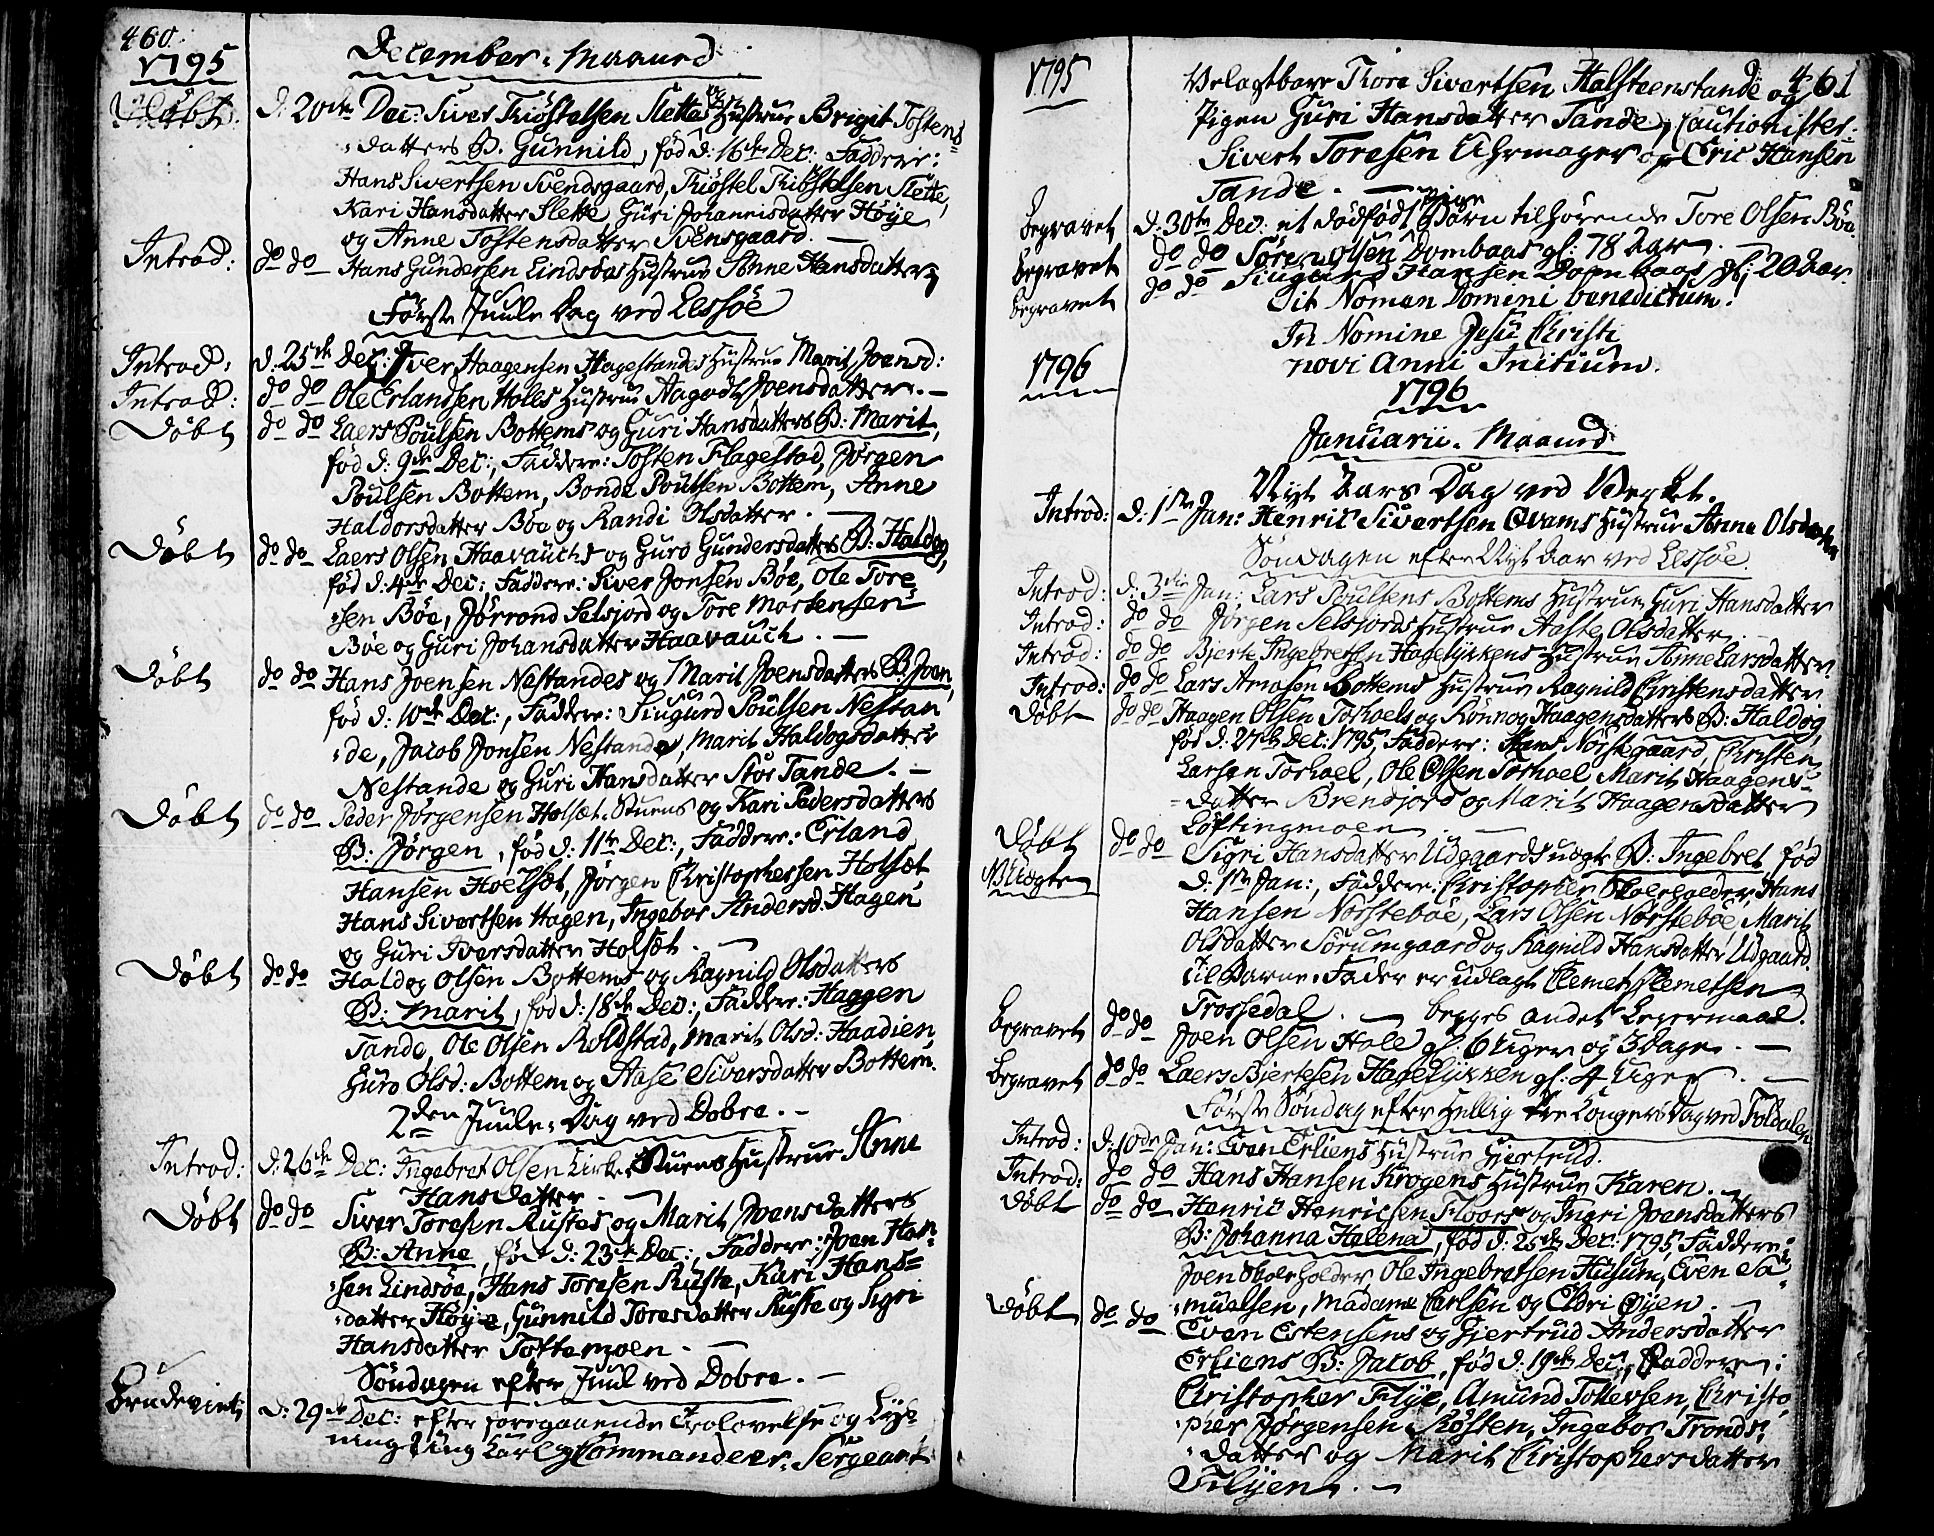 SAH, Lesja prestekontor, Ministerialbok nr. 3, 1777-1819, s. 460-461